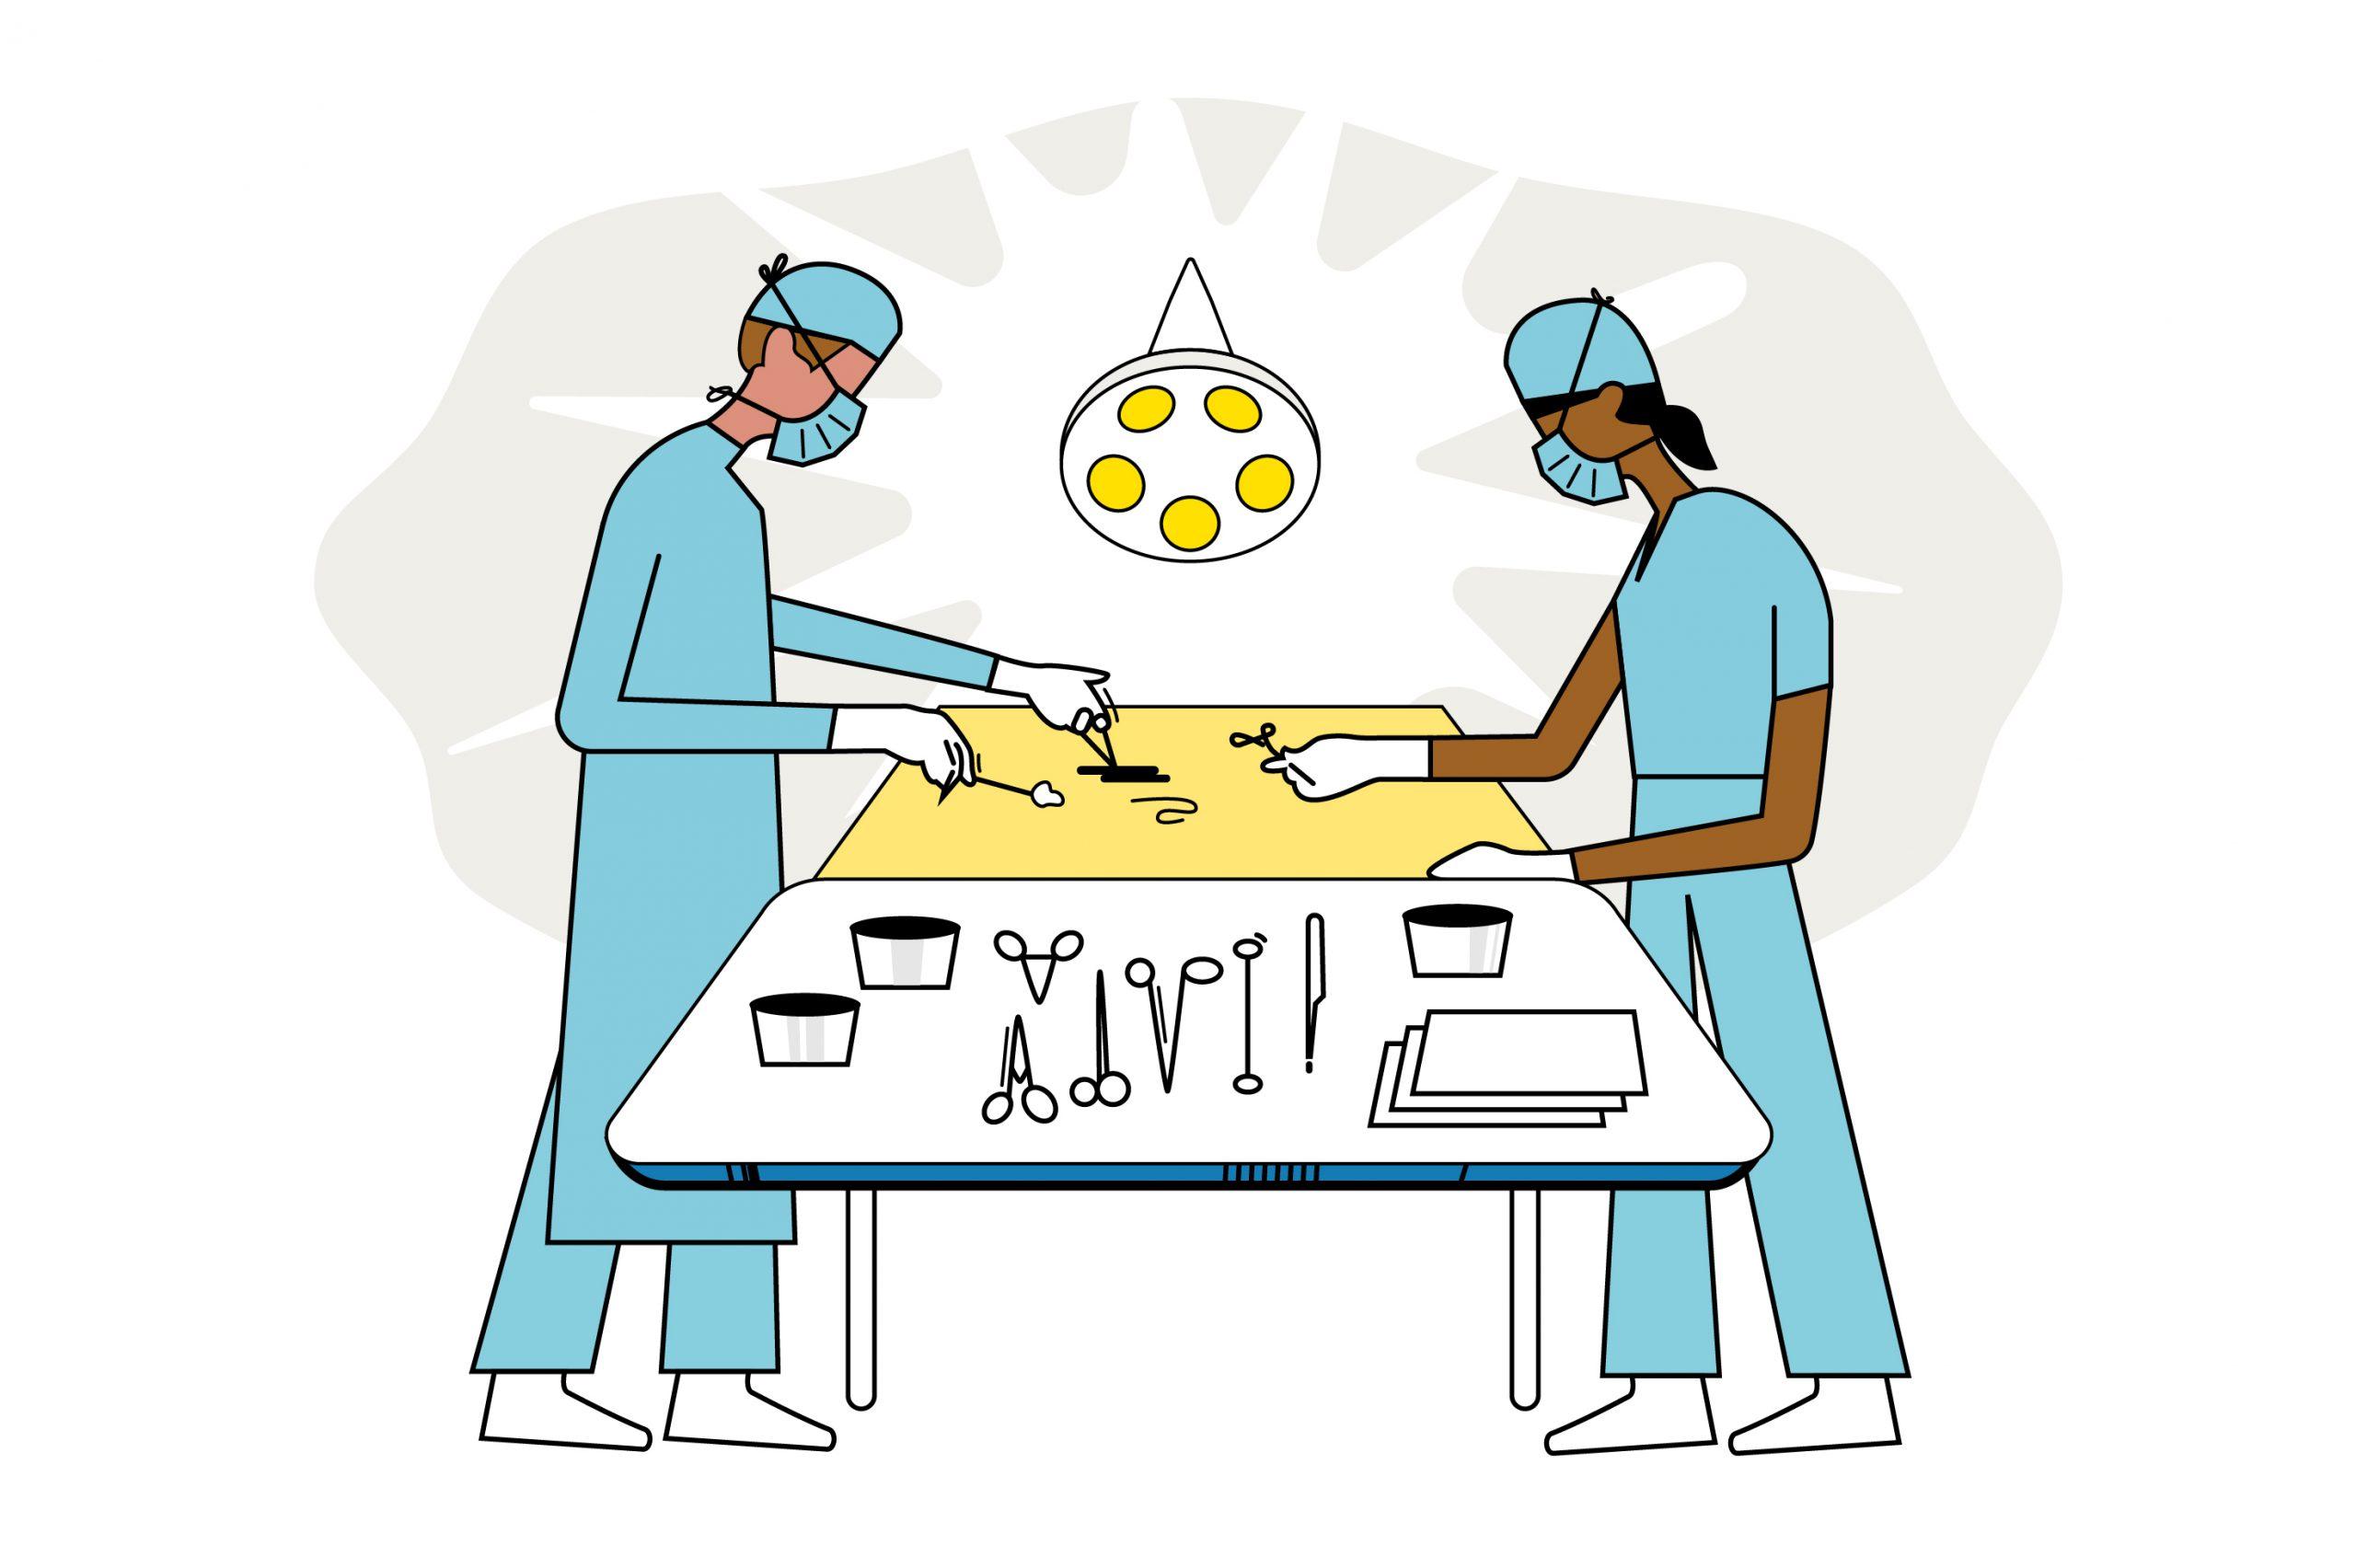 UME surgeons ER Illustration